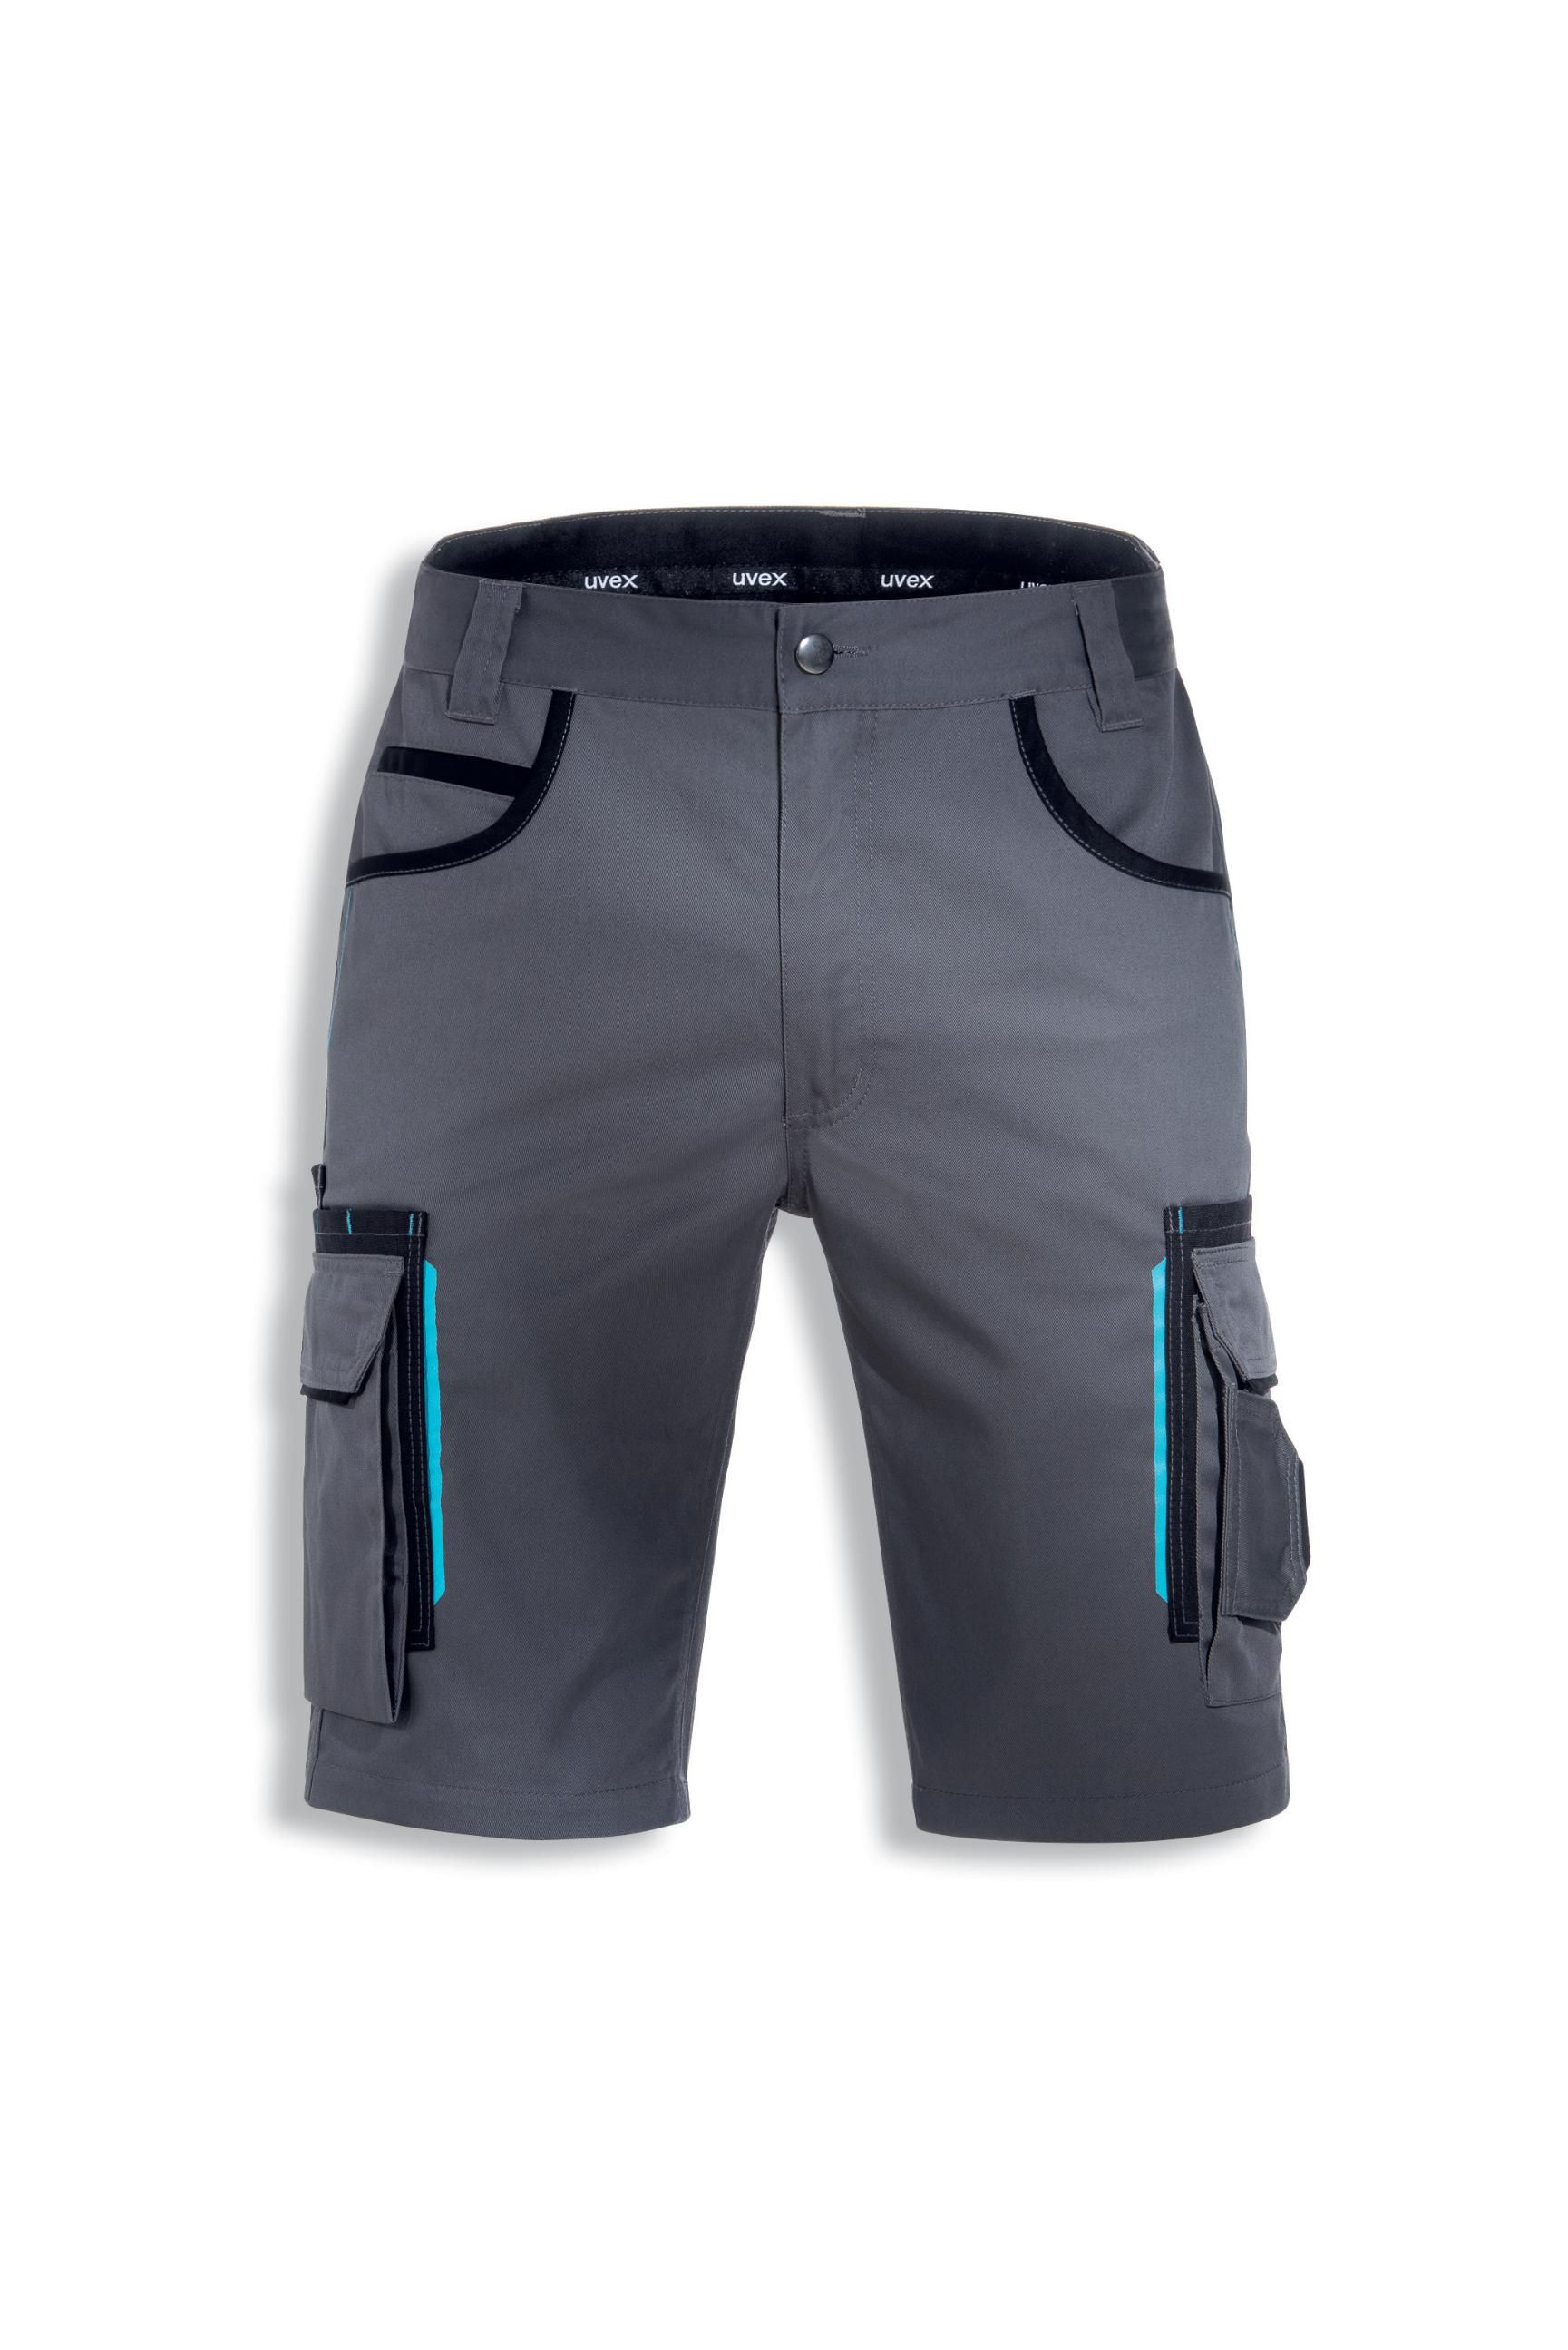 748b6d07307cee Uvex kurze Arbeits-Hose Shorts Tune Up Bermuda 9808 schwarz grau ...